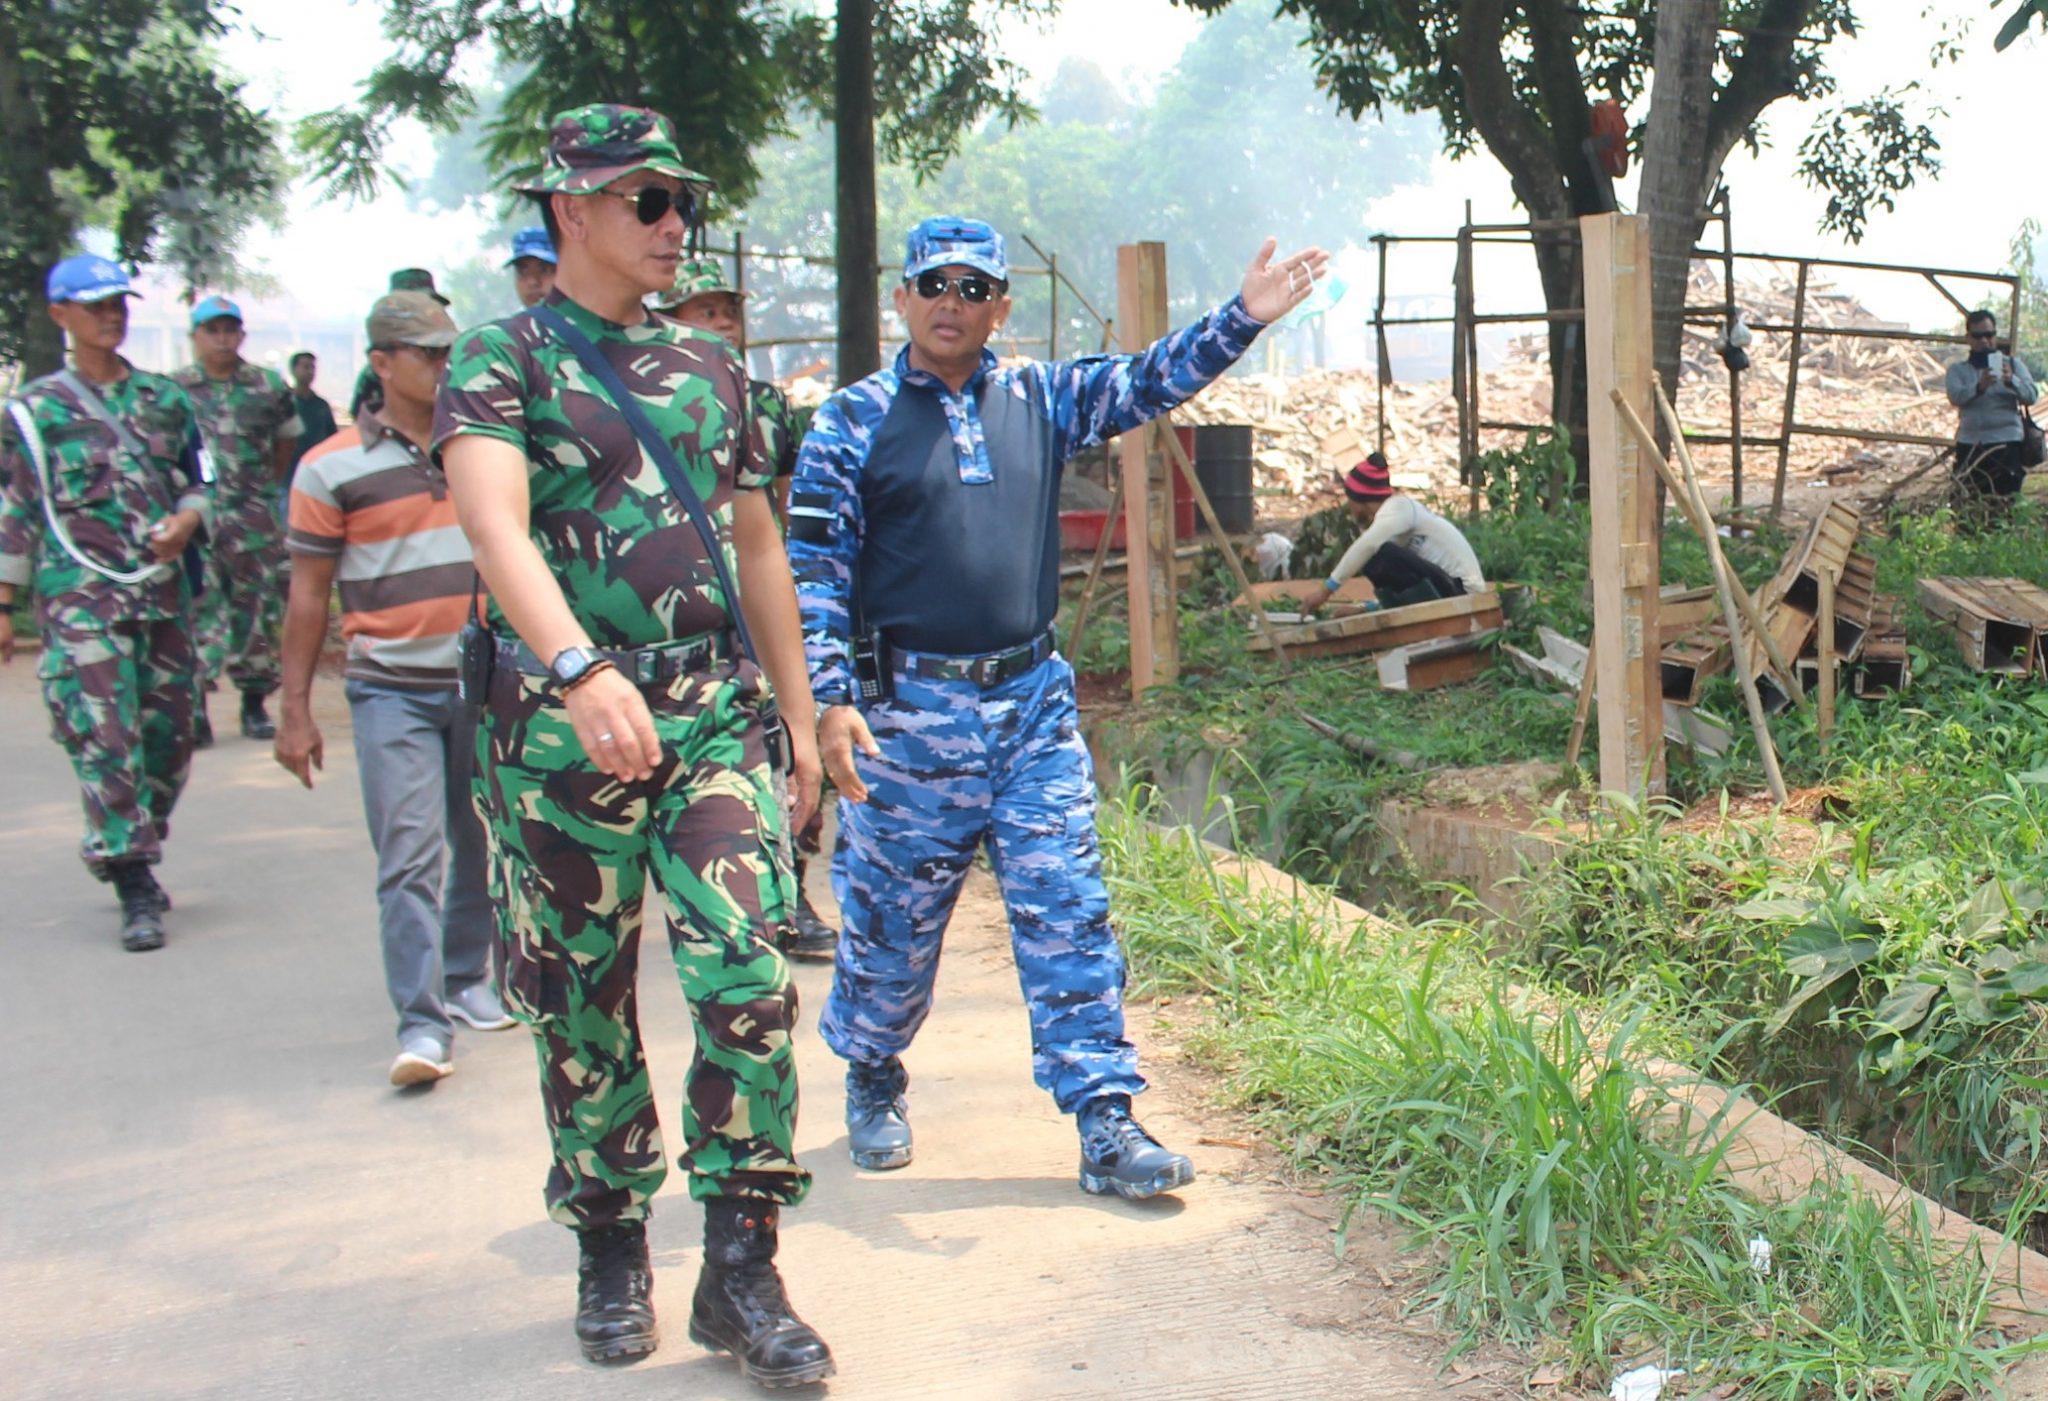 Anggota Lanud Suryadarma Kerja Bakti di Tanah Aset Negara